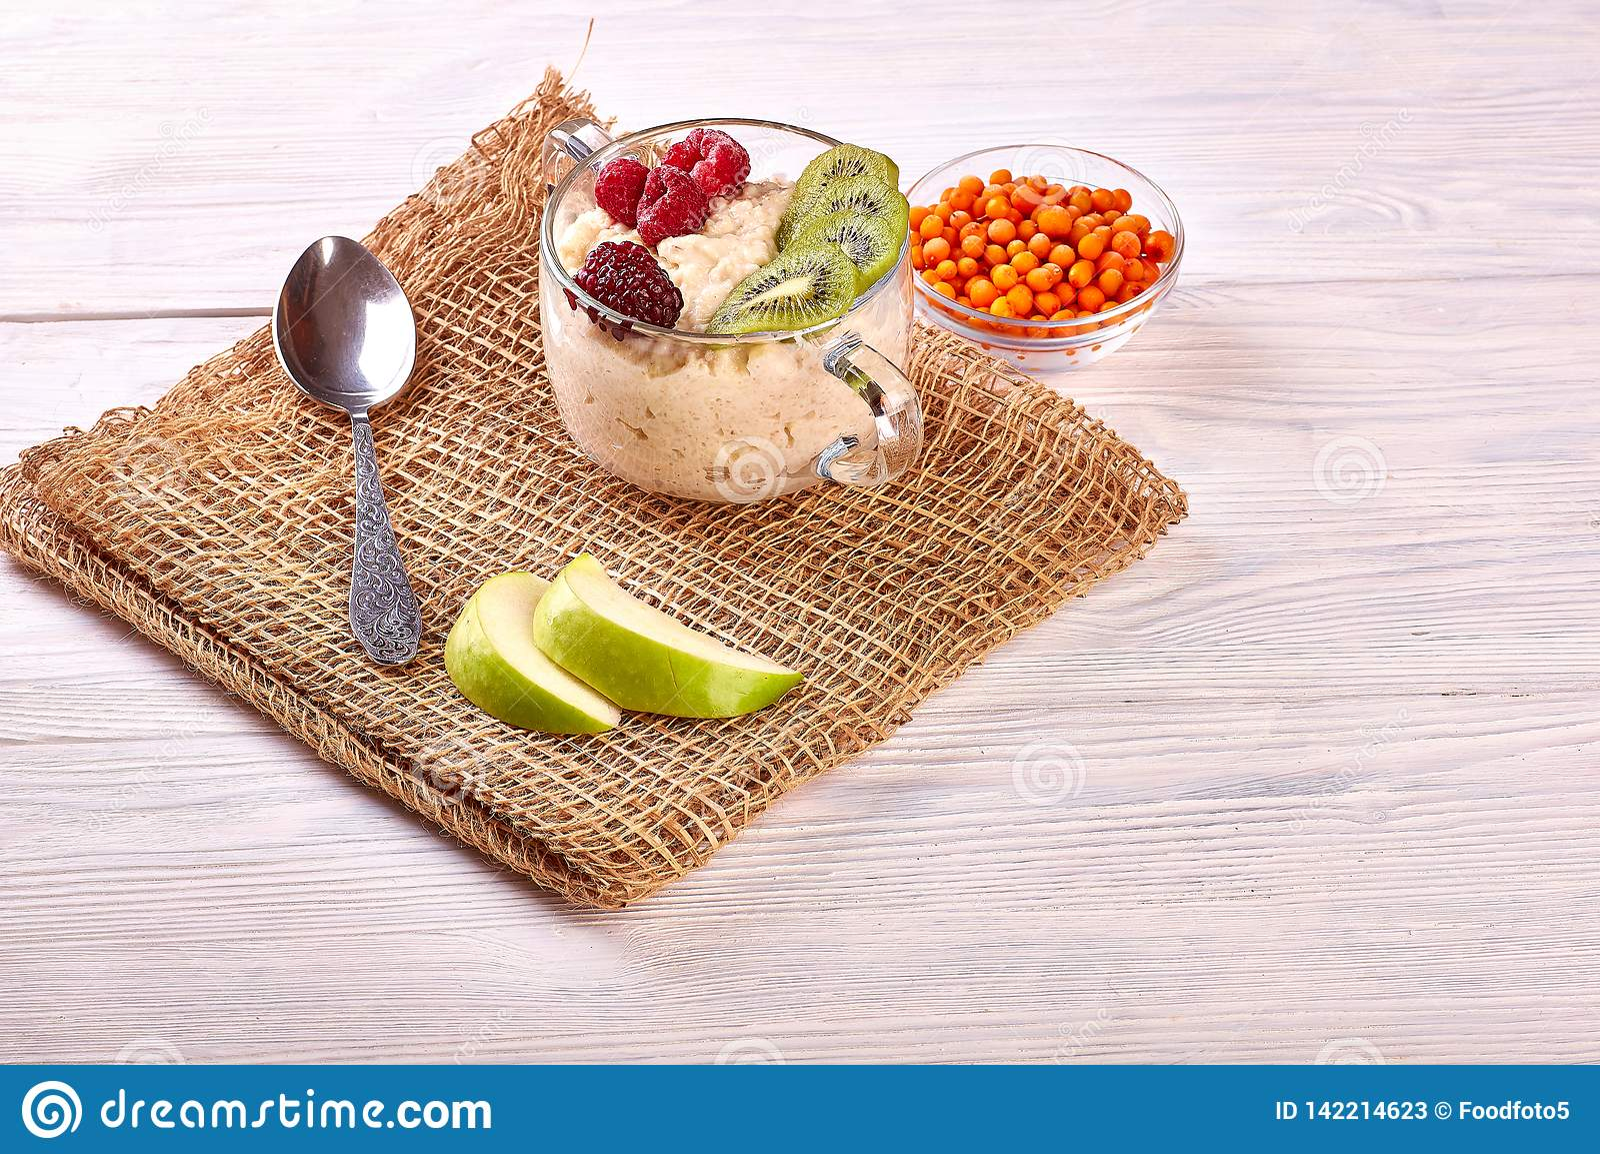 Porridge with fruit on wooden background